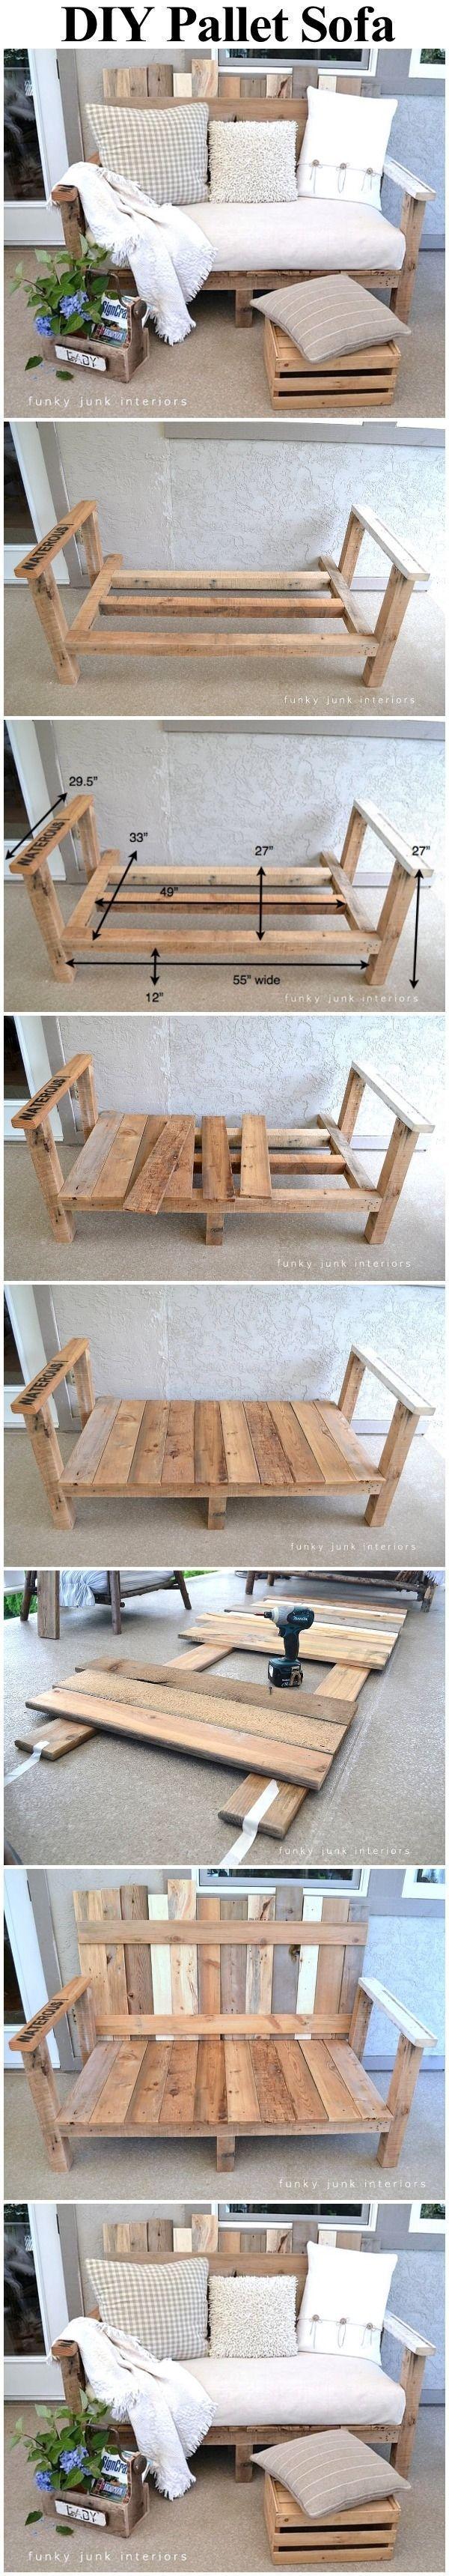 Pallet Wood Outdoor Sofa summer diy craft crafts diy ideas diy crafts backyard ideas summer backyard ideas backyard projects pallet wood idea